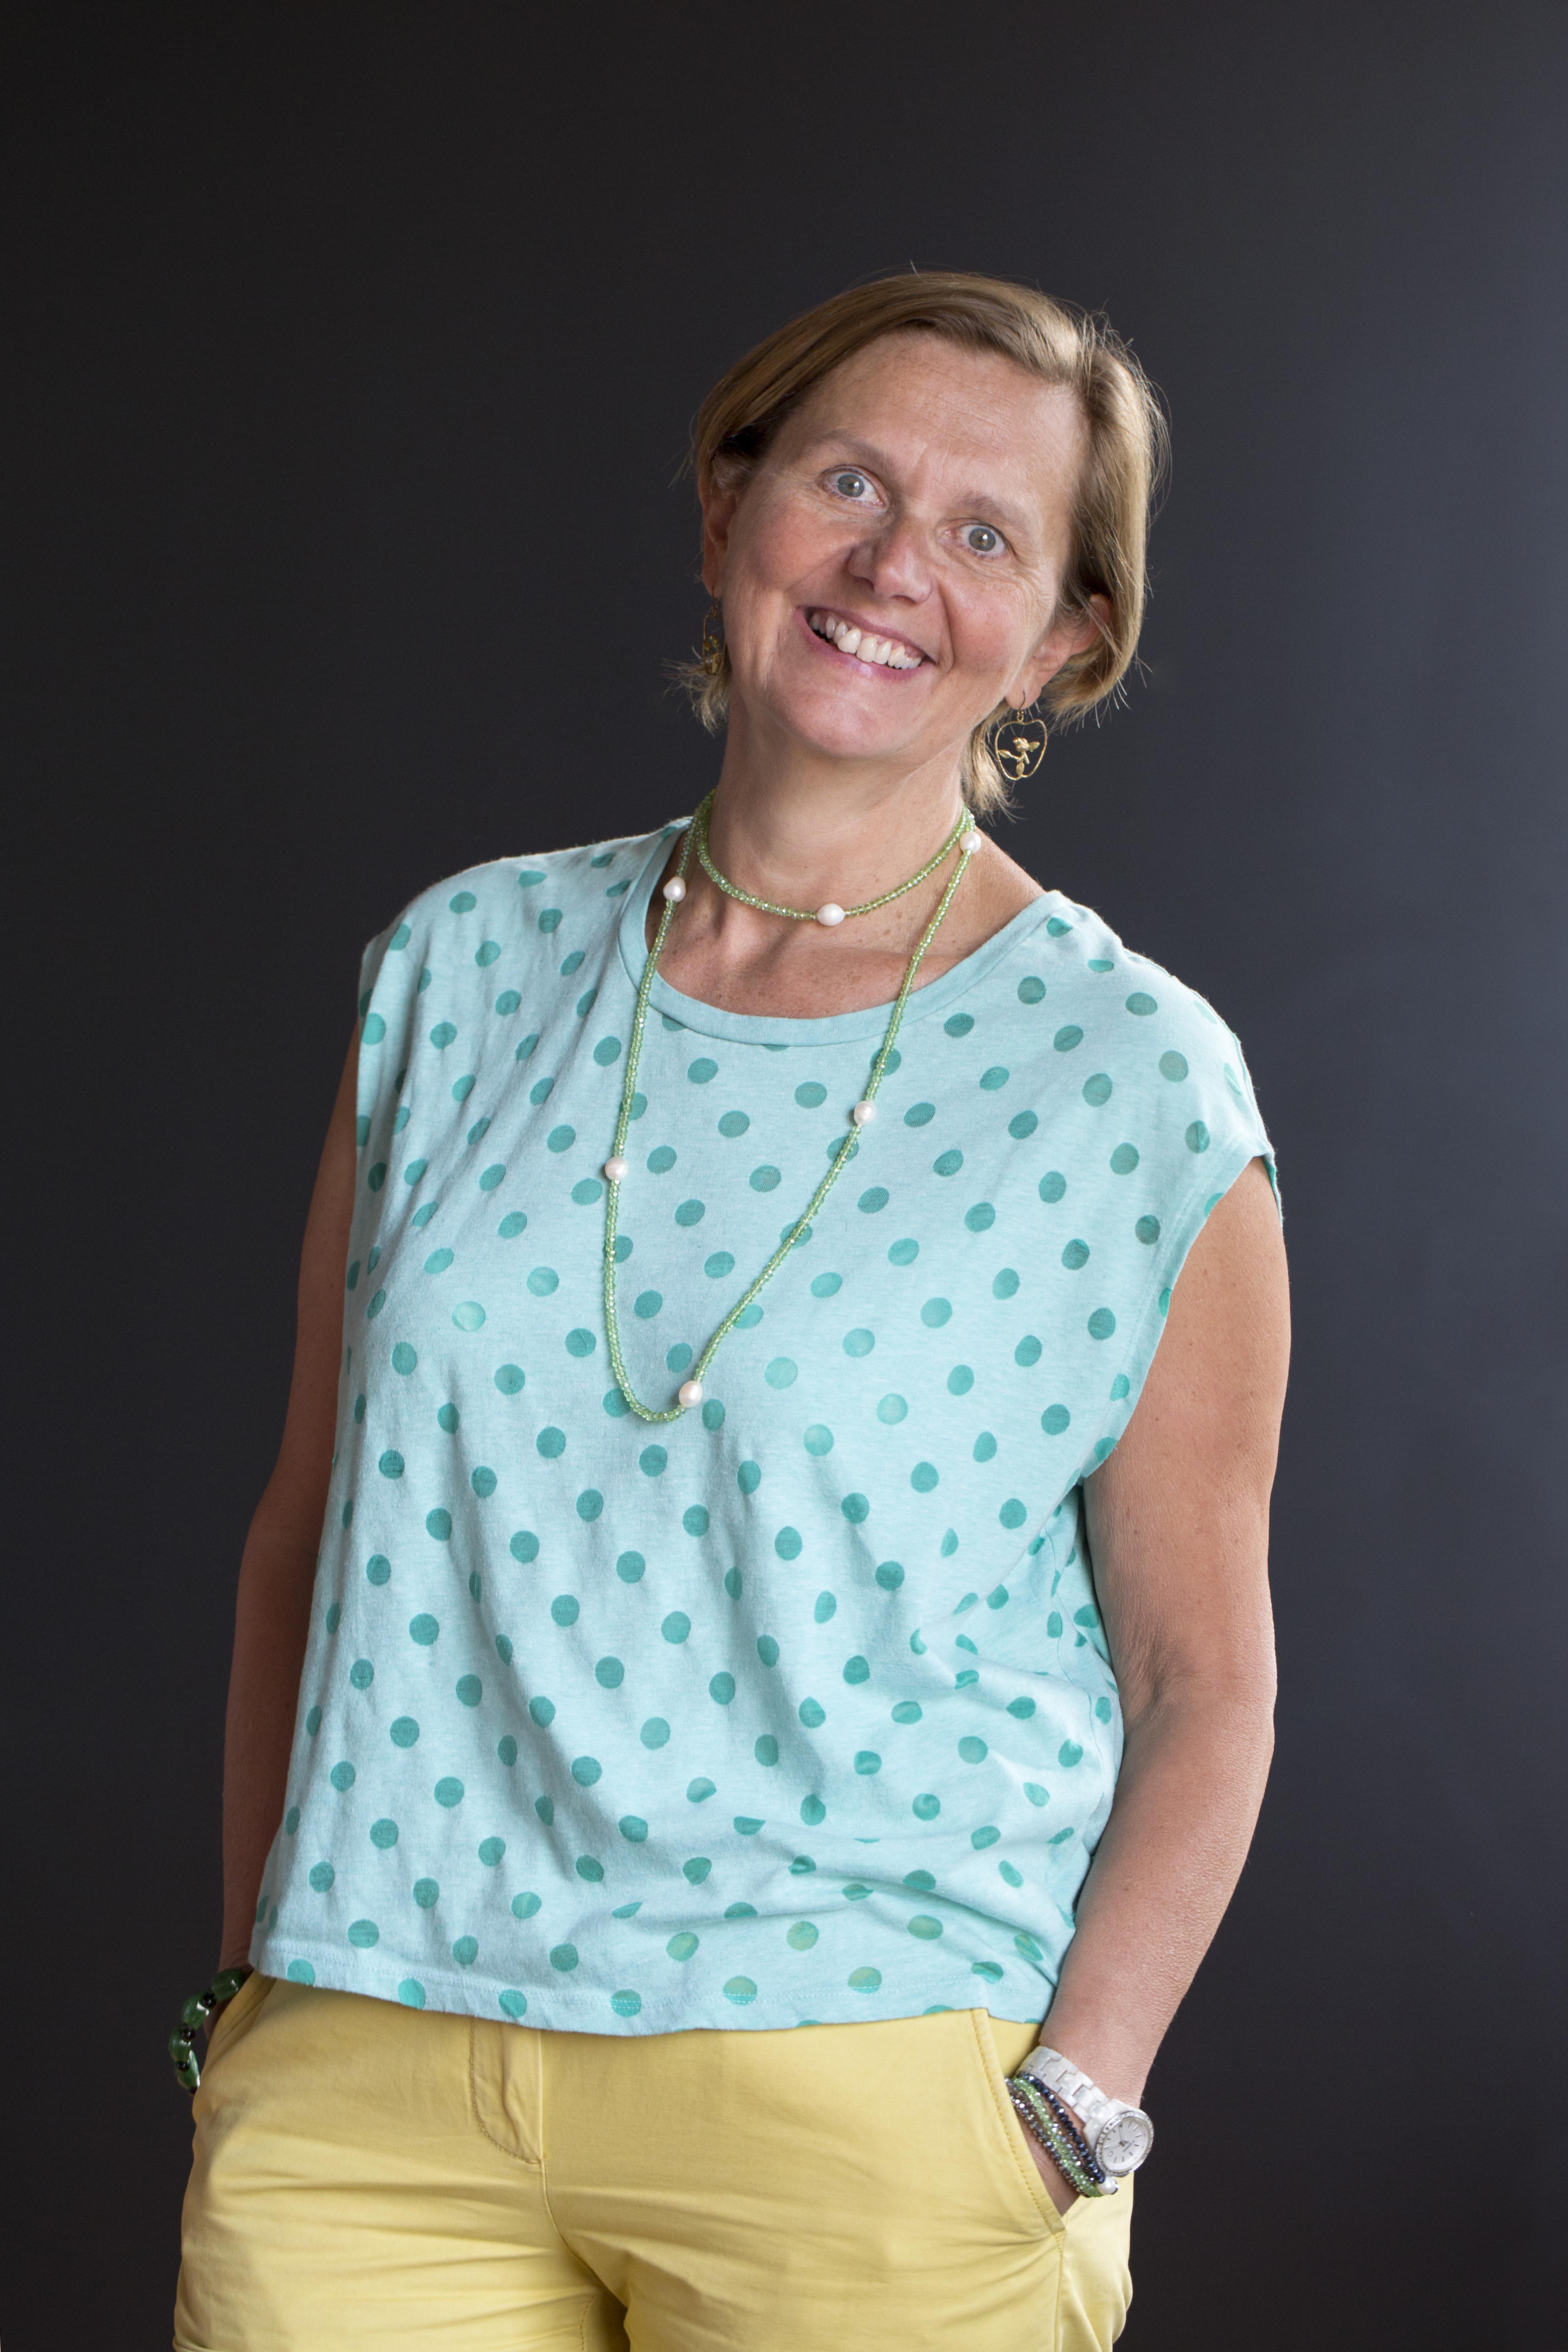 Marie-Stéphanie Descotes-Genon